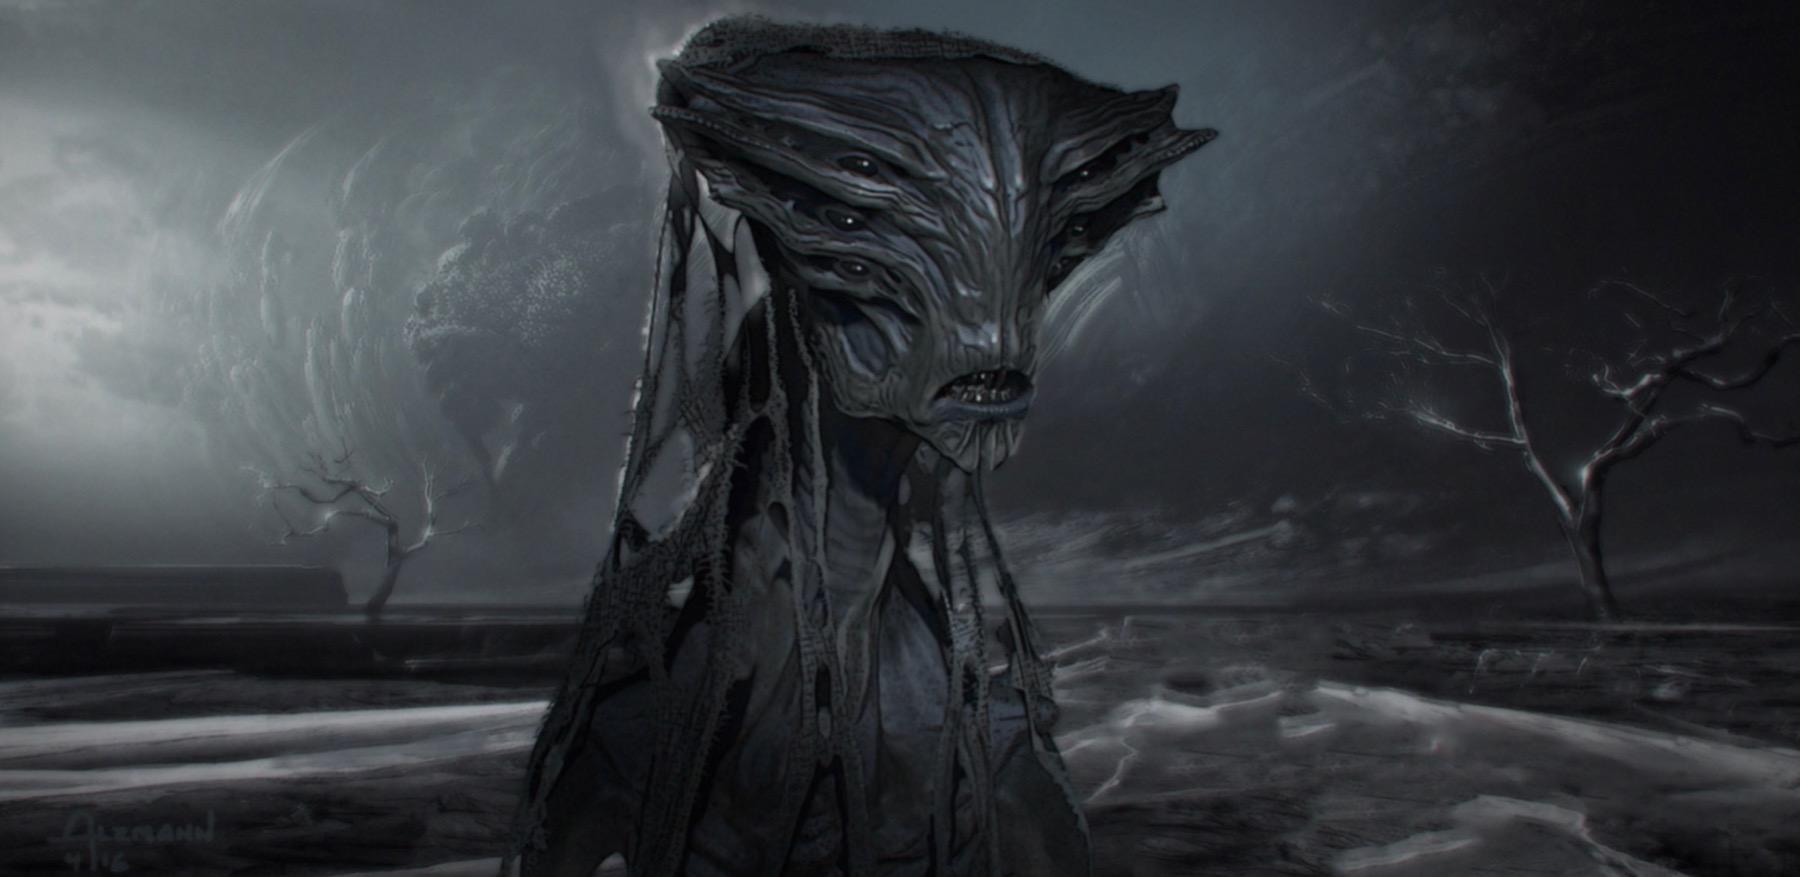 https://www.starwars-universe.com/images/actualites/episode9/conceptarts_trevorrow/06.jpg